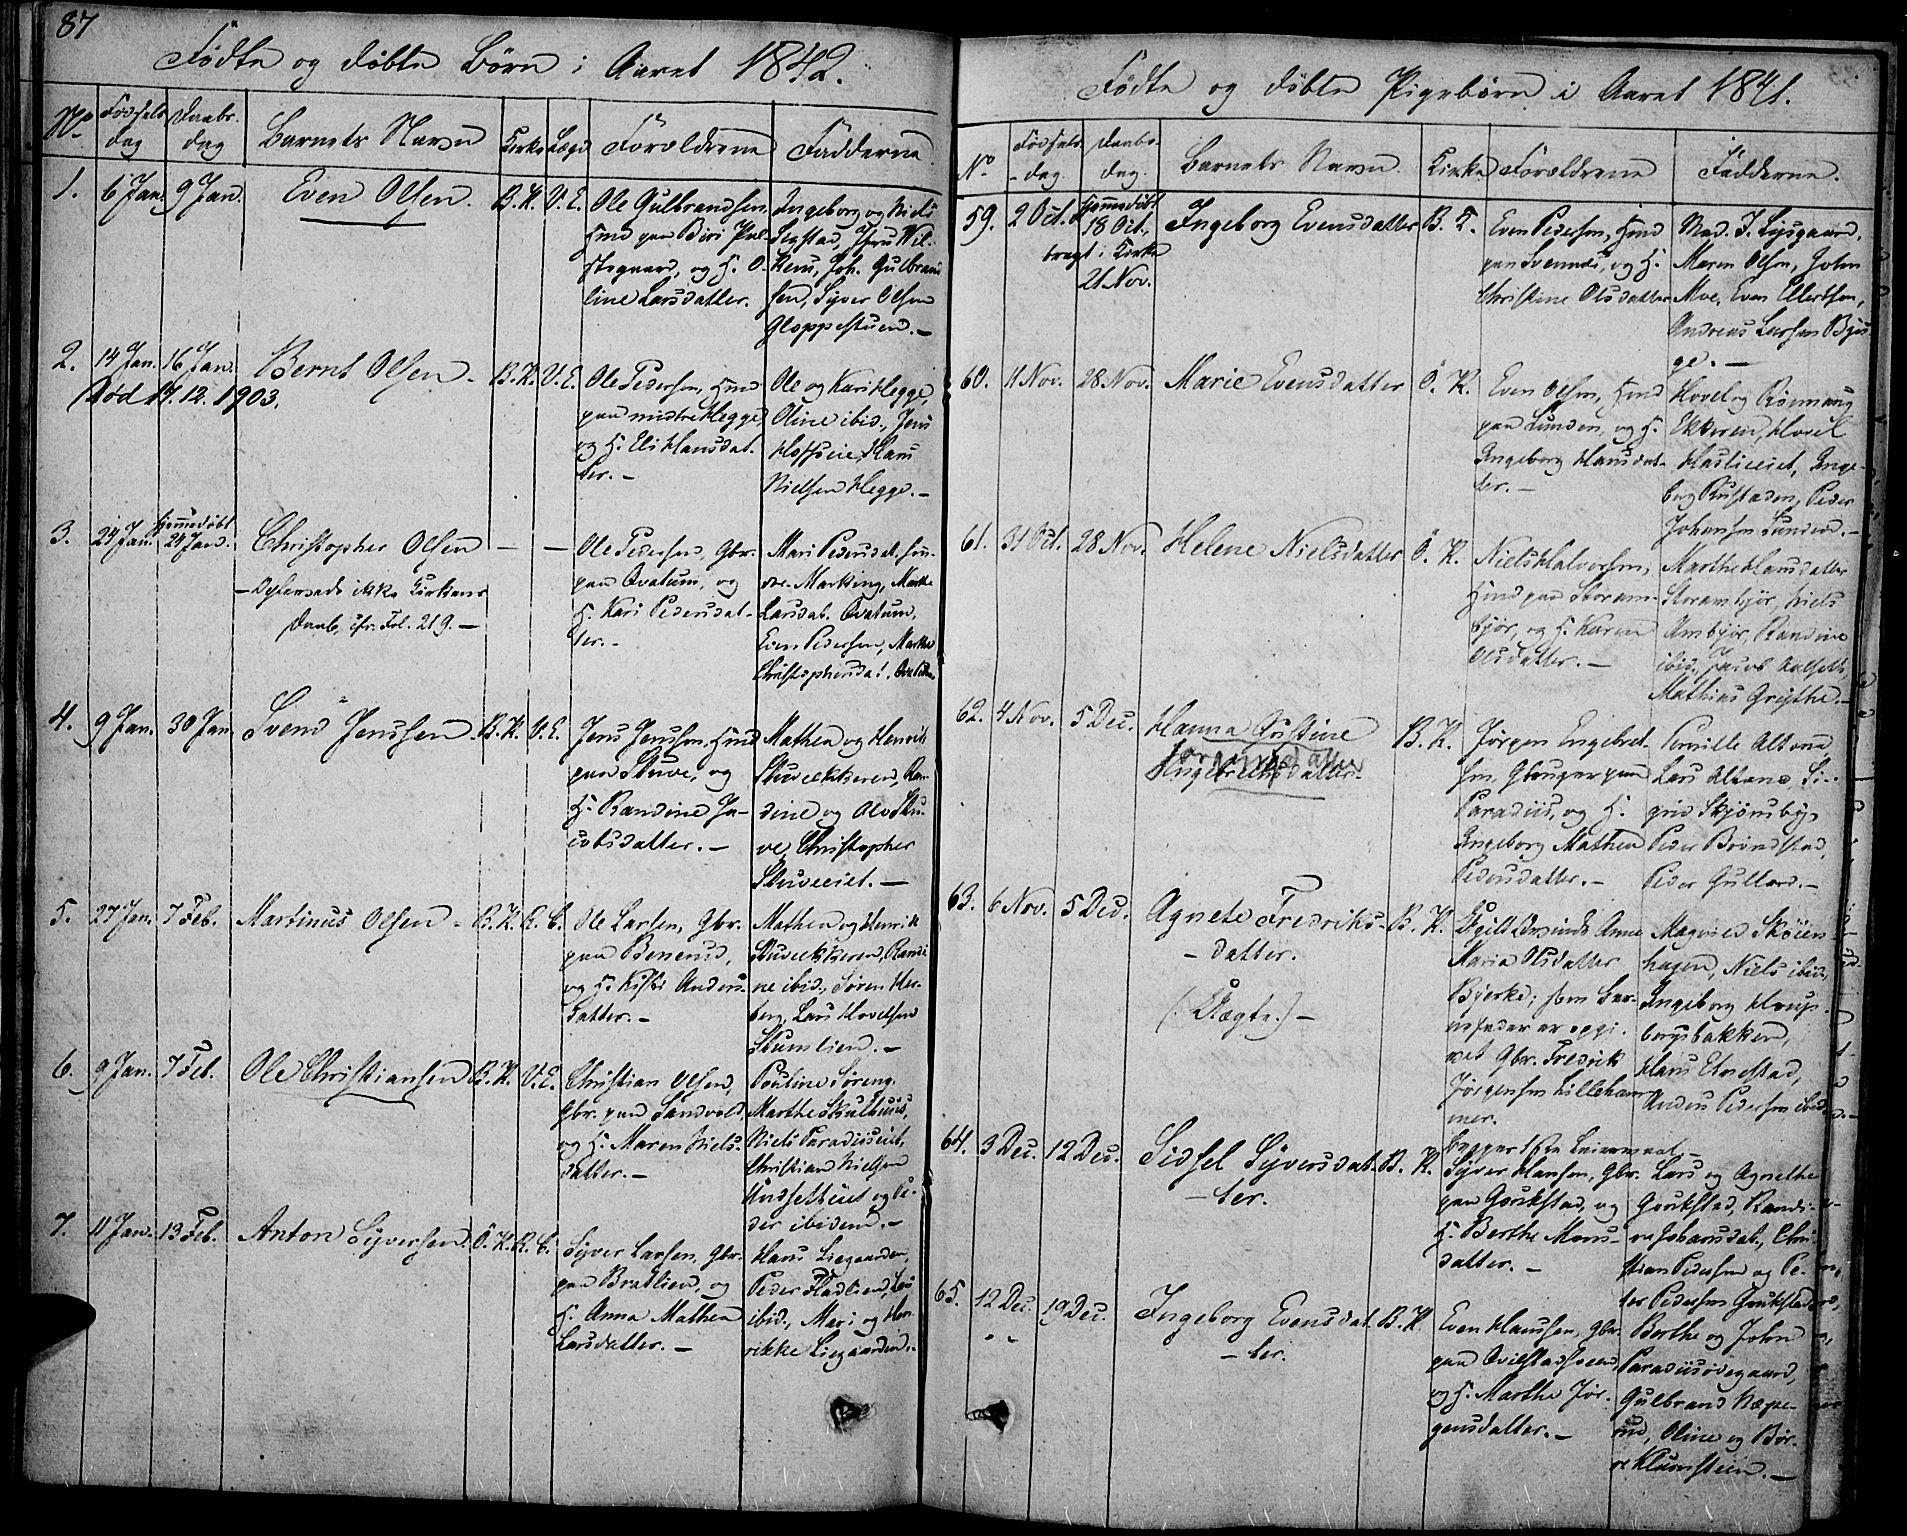 SAH, Biri prestekontor, Ministerialbok nr. 4, 1829-1842, s. 87